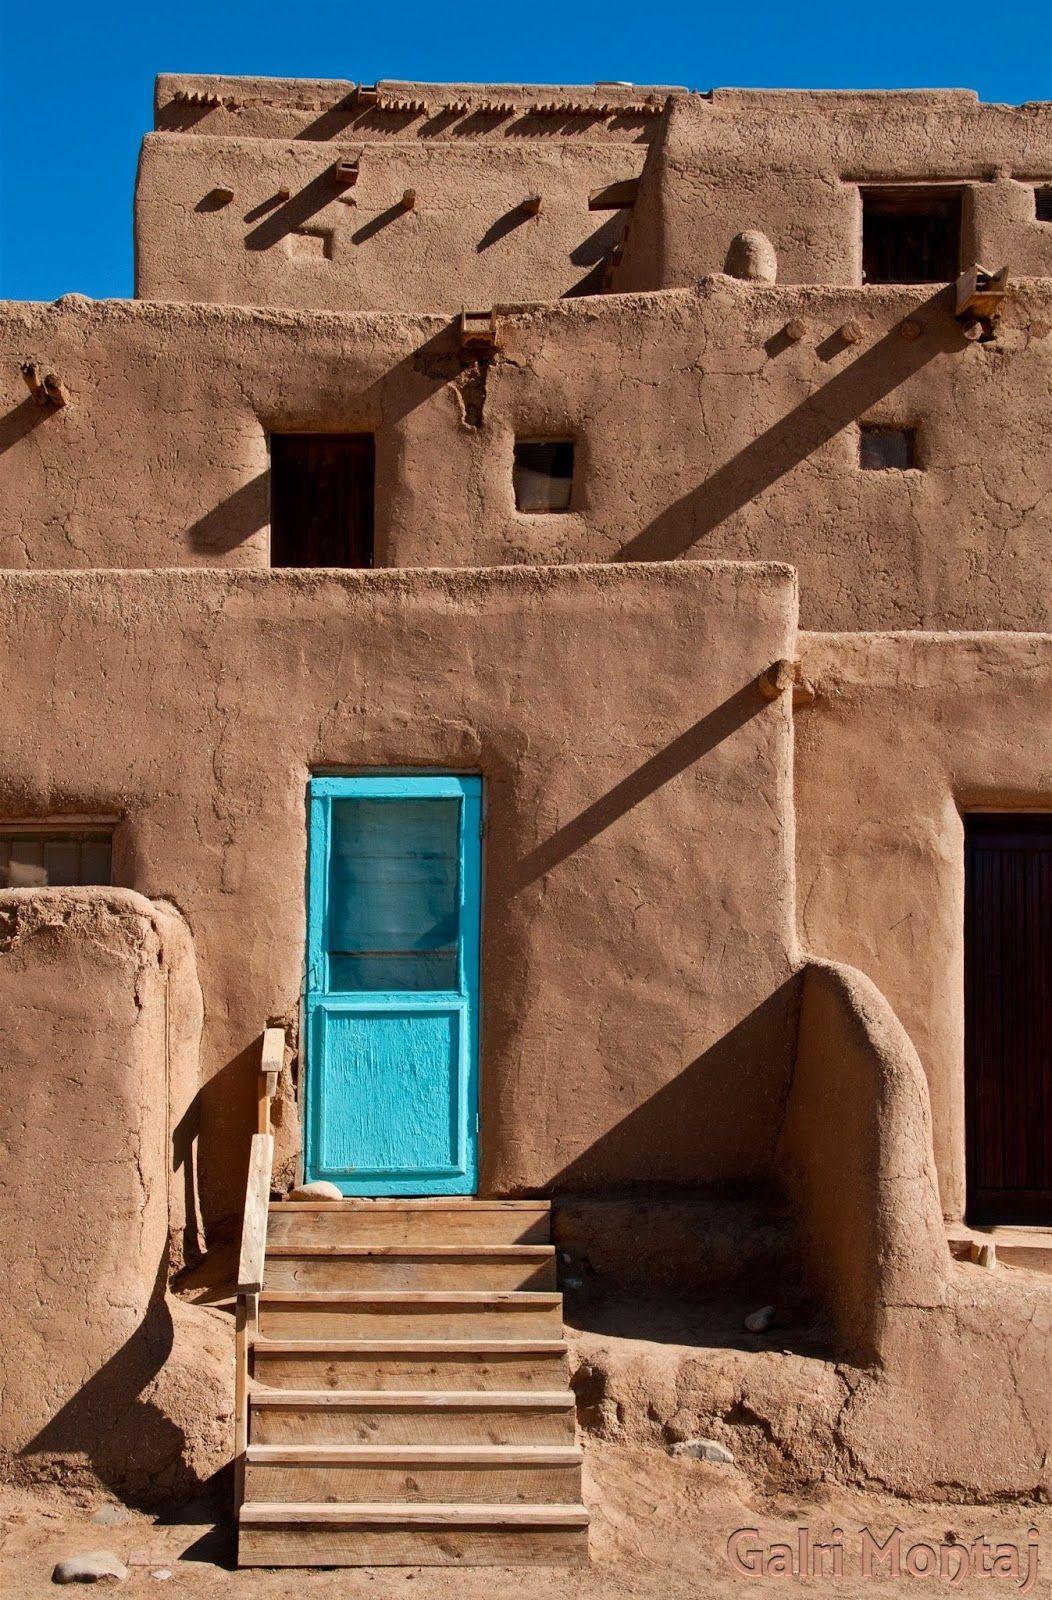 Native American Art Houses Designs Html on